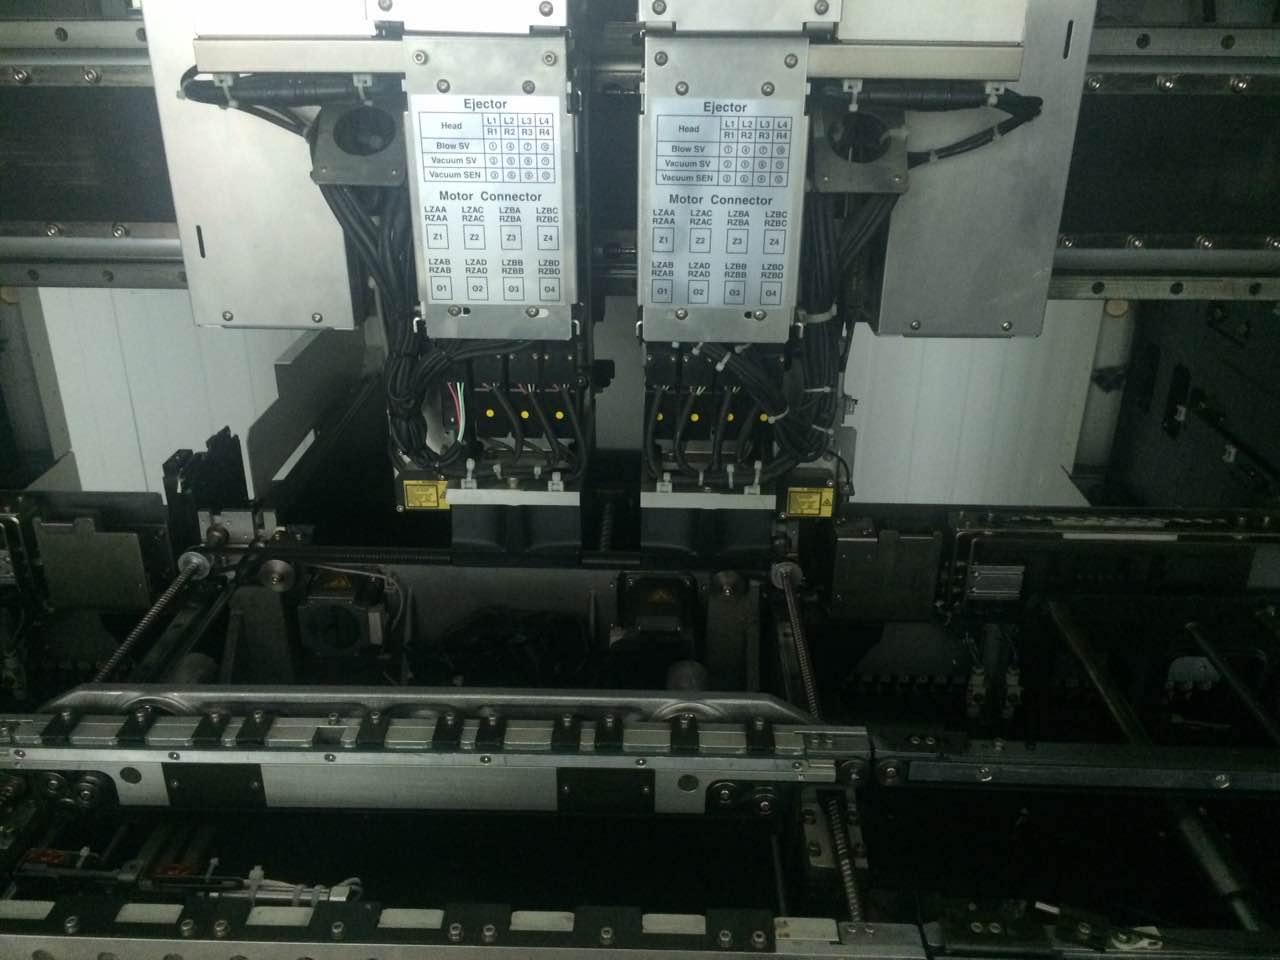 JUKI FX-1R 贴片机 精度高 稳定. 模组贴片机 现货